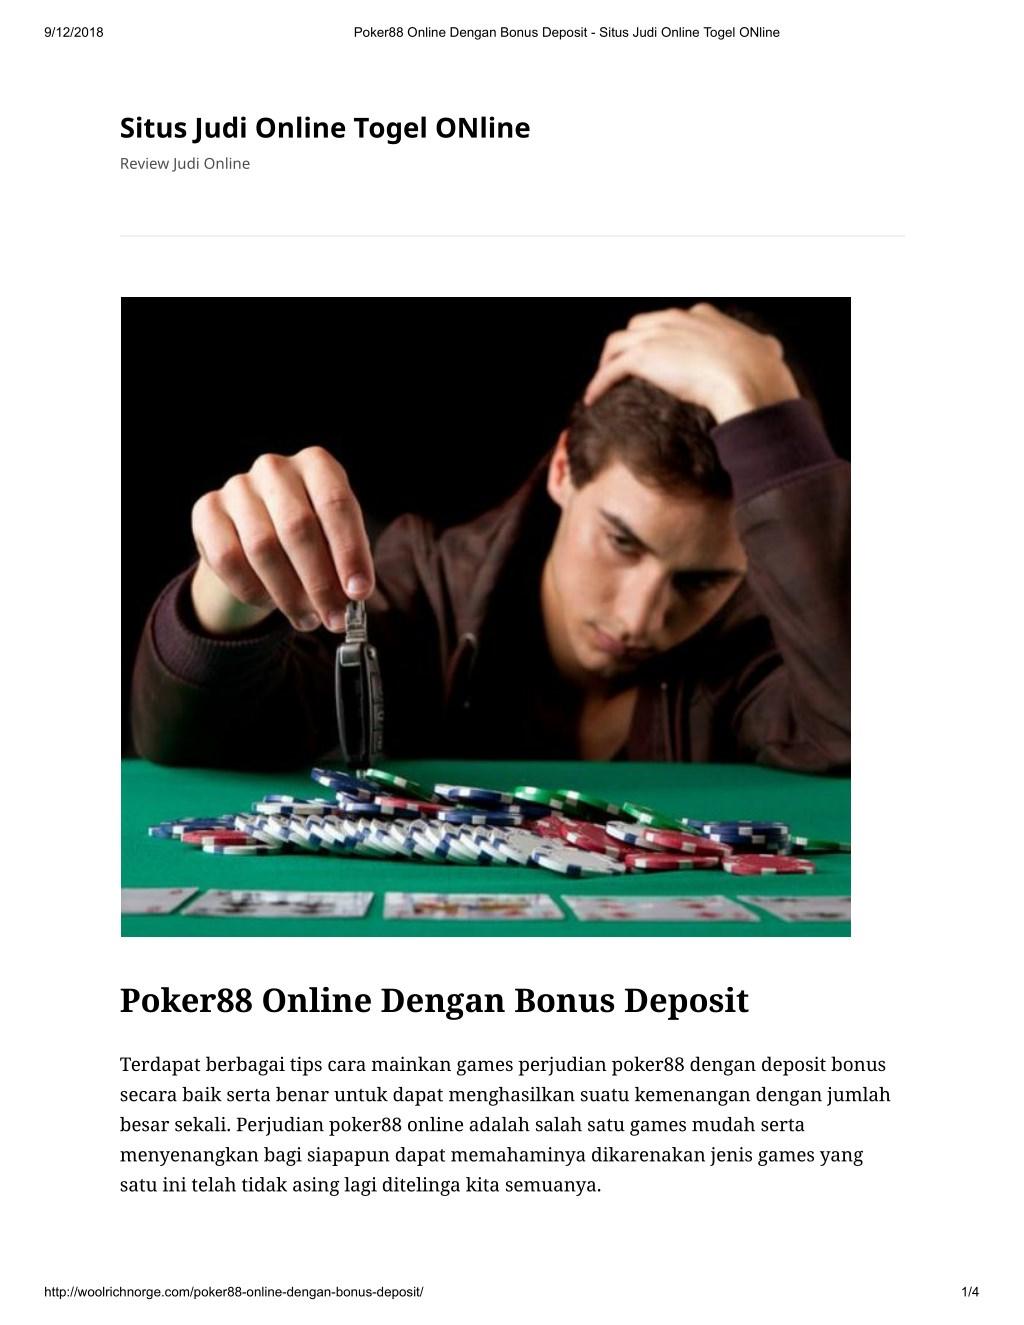 Ppt Poker88 Online Dengan Bonus Deposit Powerpoint Presentation Free Download Id 8004726